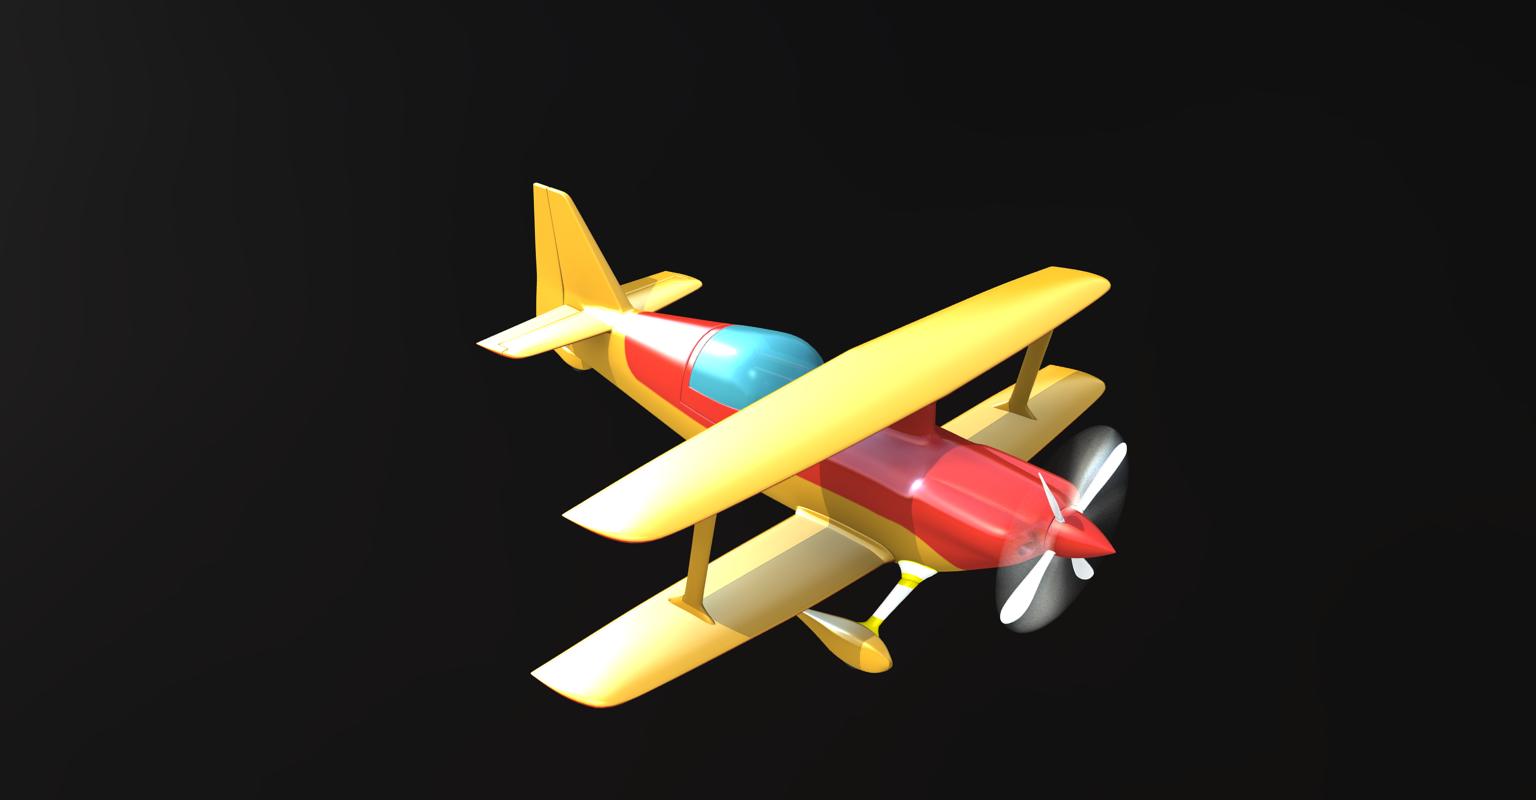 airshow2017_biplane_02_highres.png